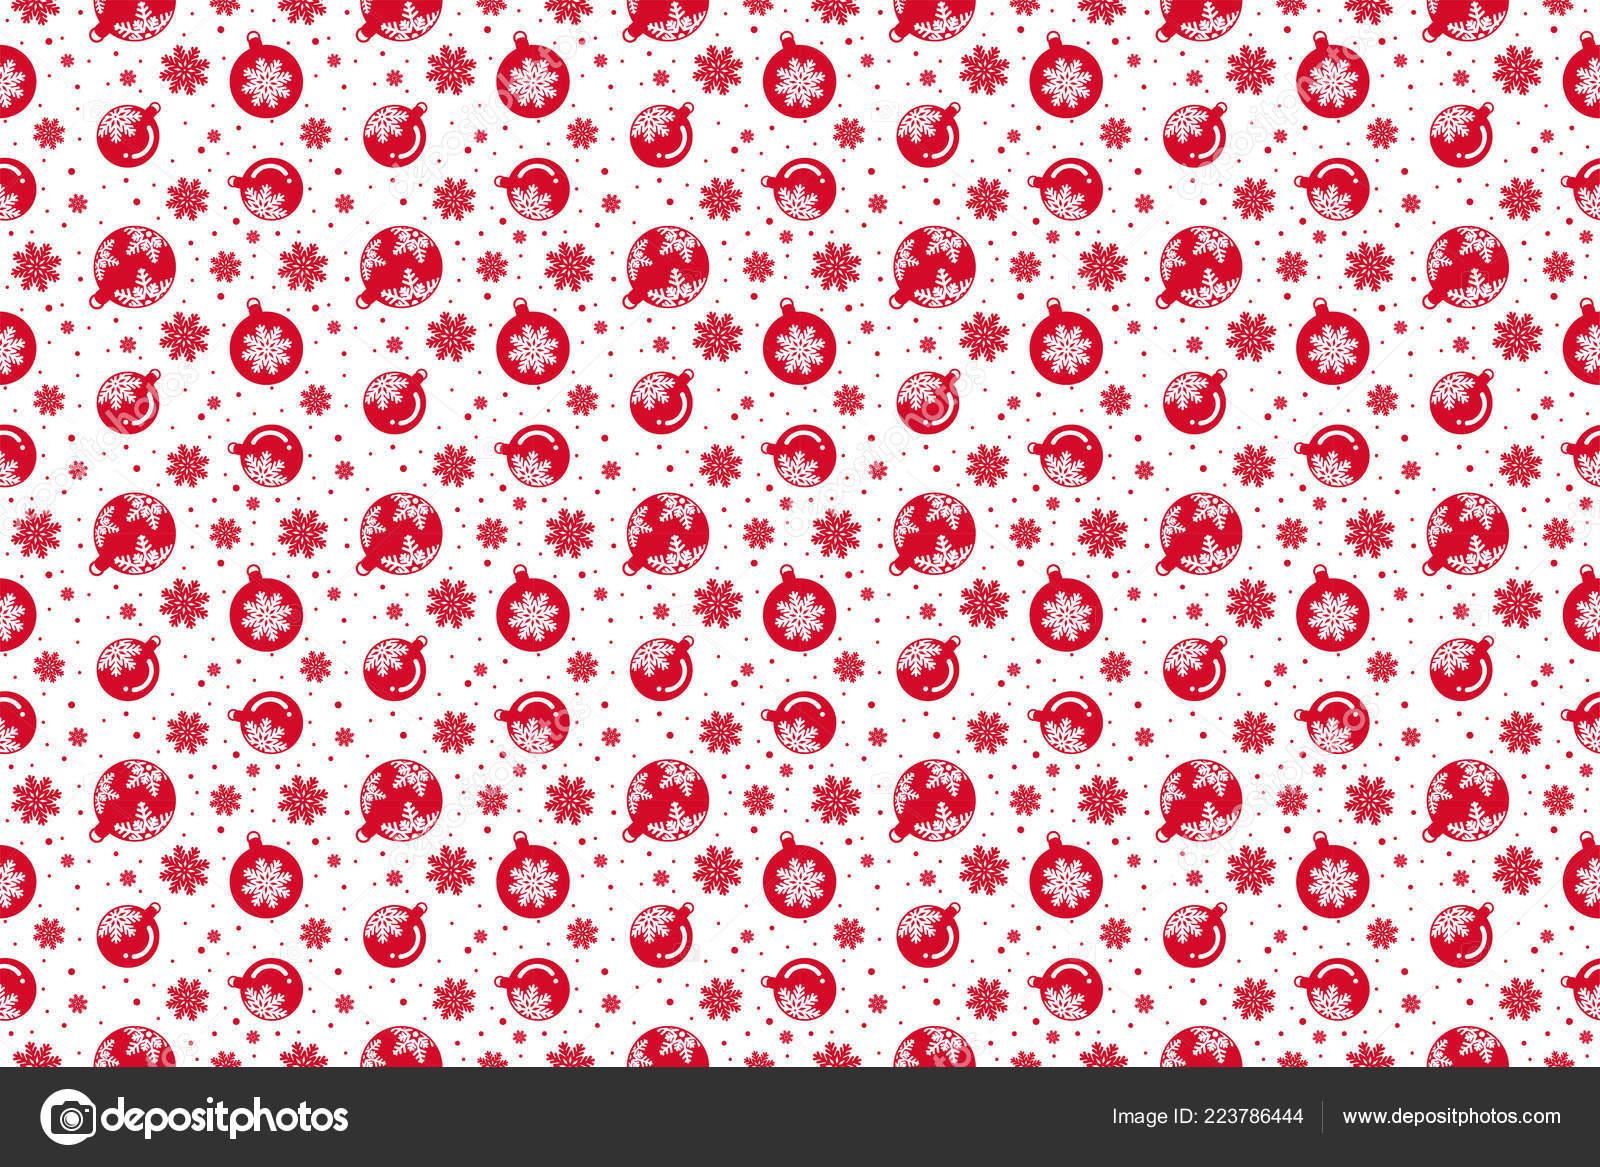 depositphotos 223786444 stock illustration merry christmas pattern seamless christmas